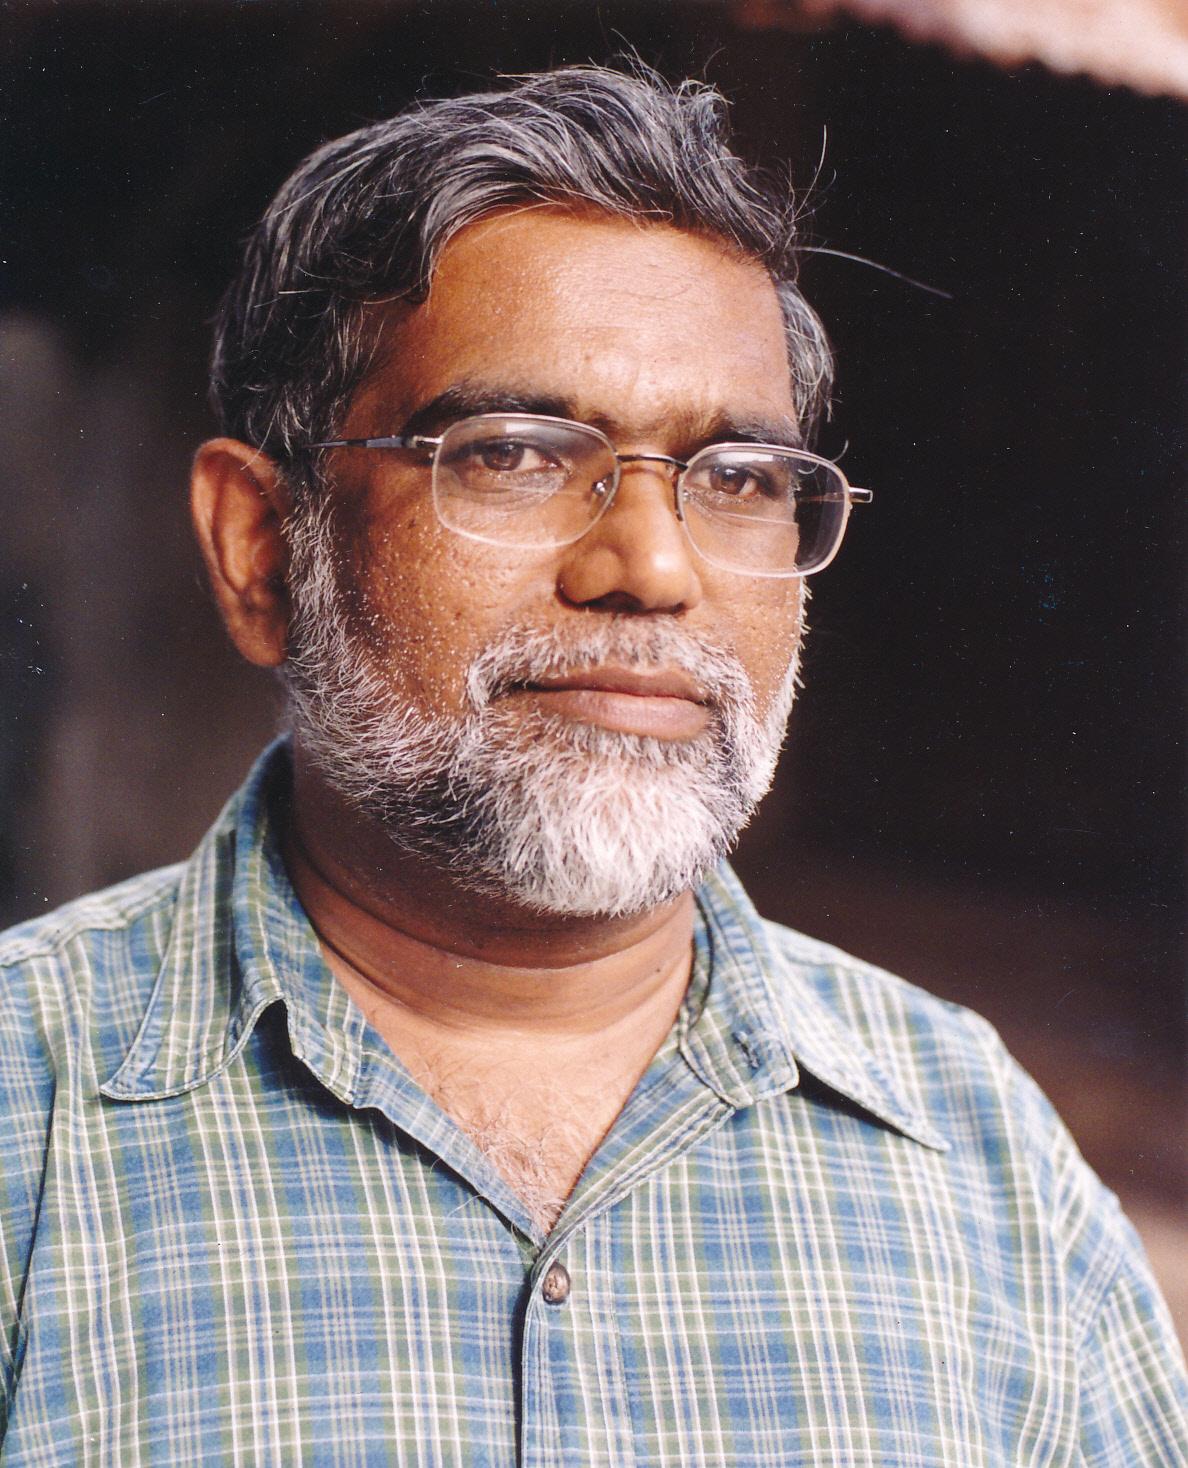 R. Siva Kumar